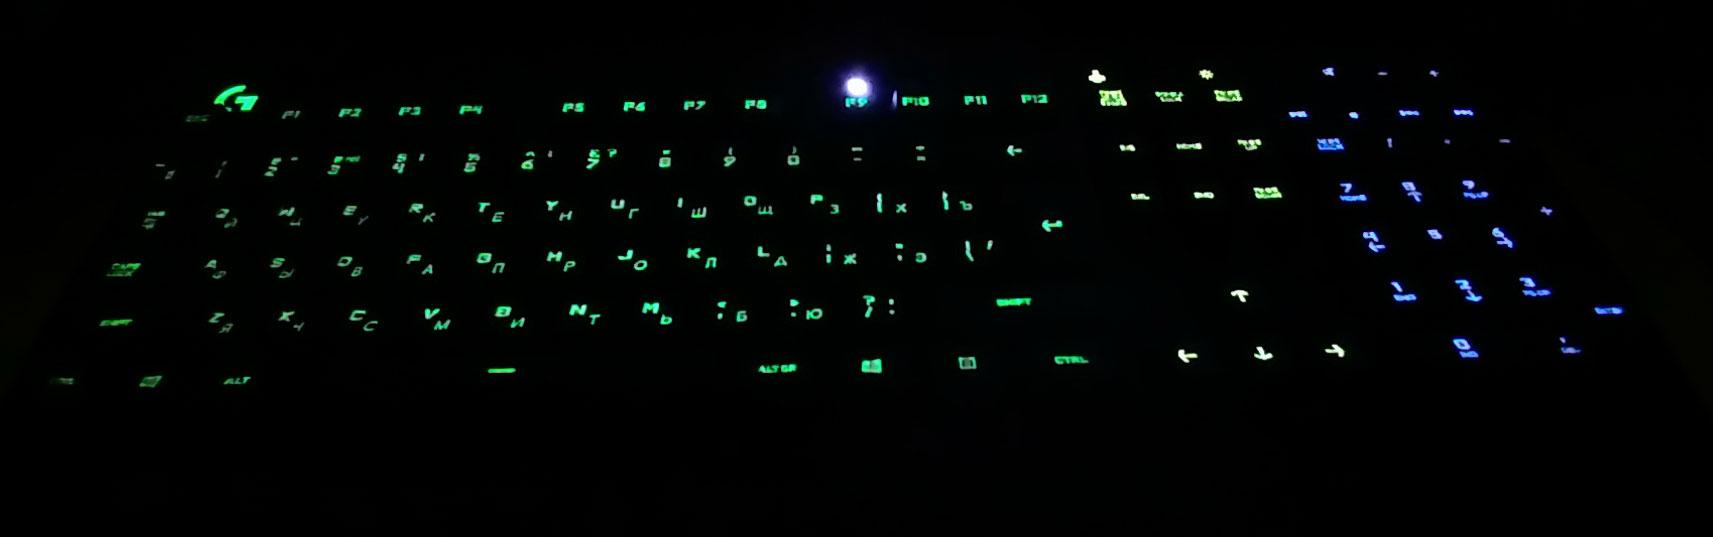 g213 | Клавиатура здорового человека